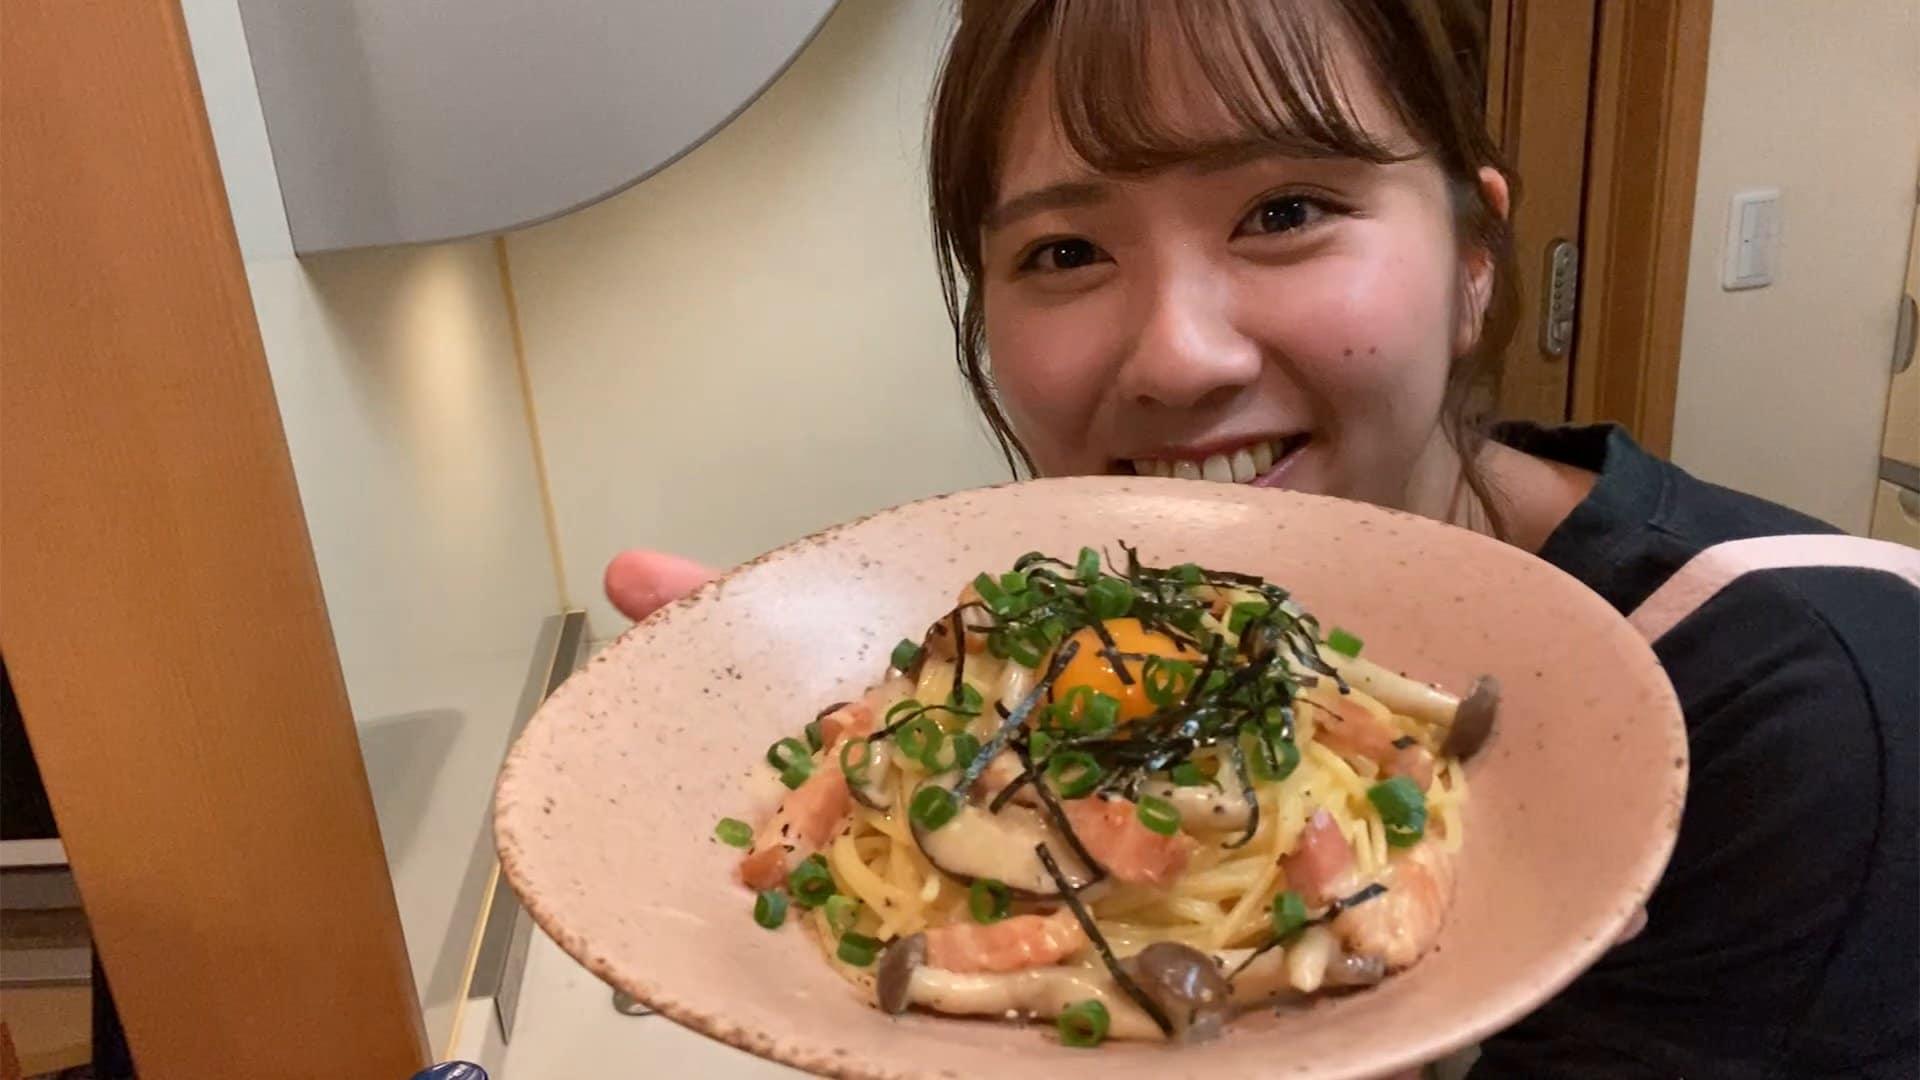 AKB48/OUC48プロジェクト×農林水産省日本の牛乳を救う新企画・緊急特番「OUC48のワンモ〜レシピ」配信スタート!【写真13枚】の画像006